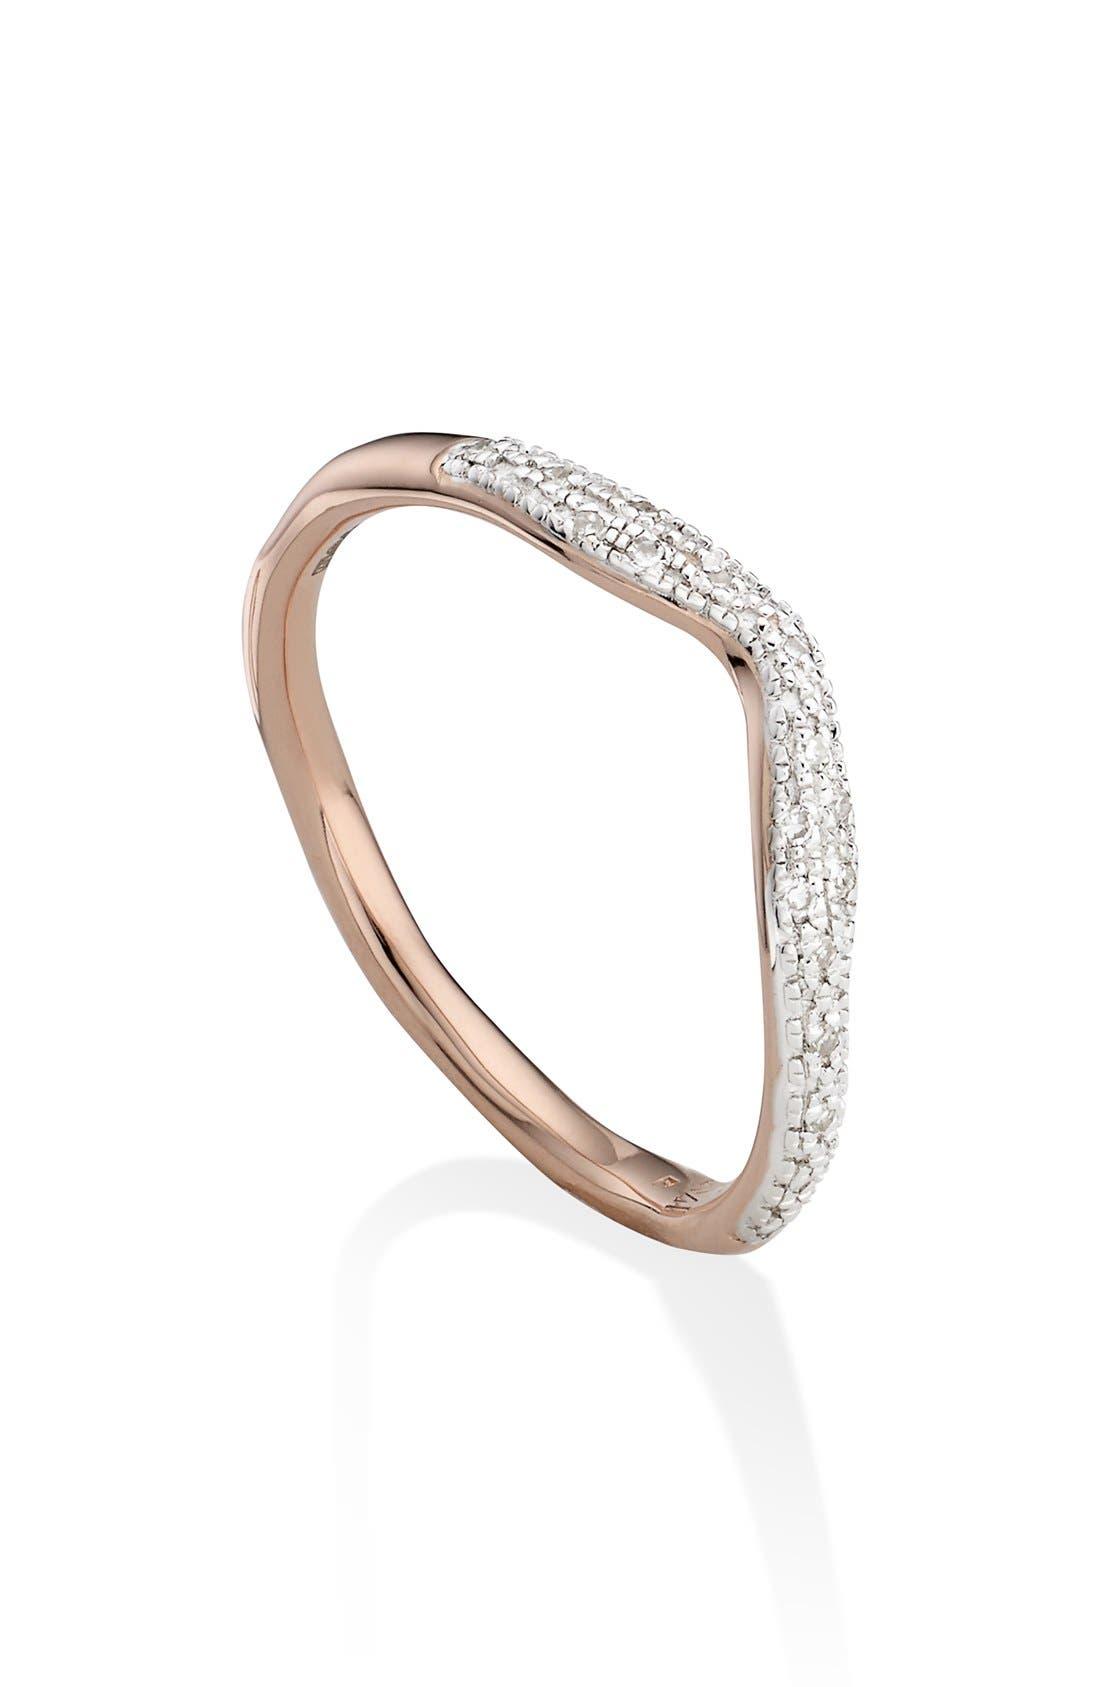 Monica Vinader 'Riva' Diamond Stacking Ring